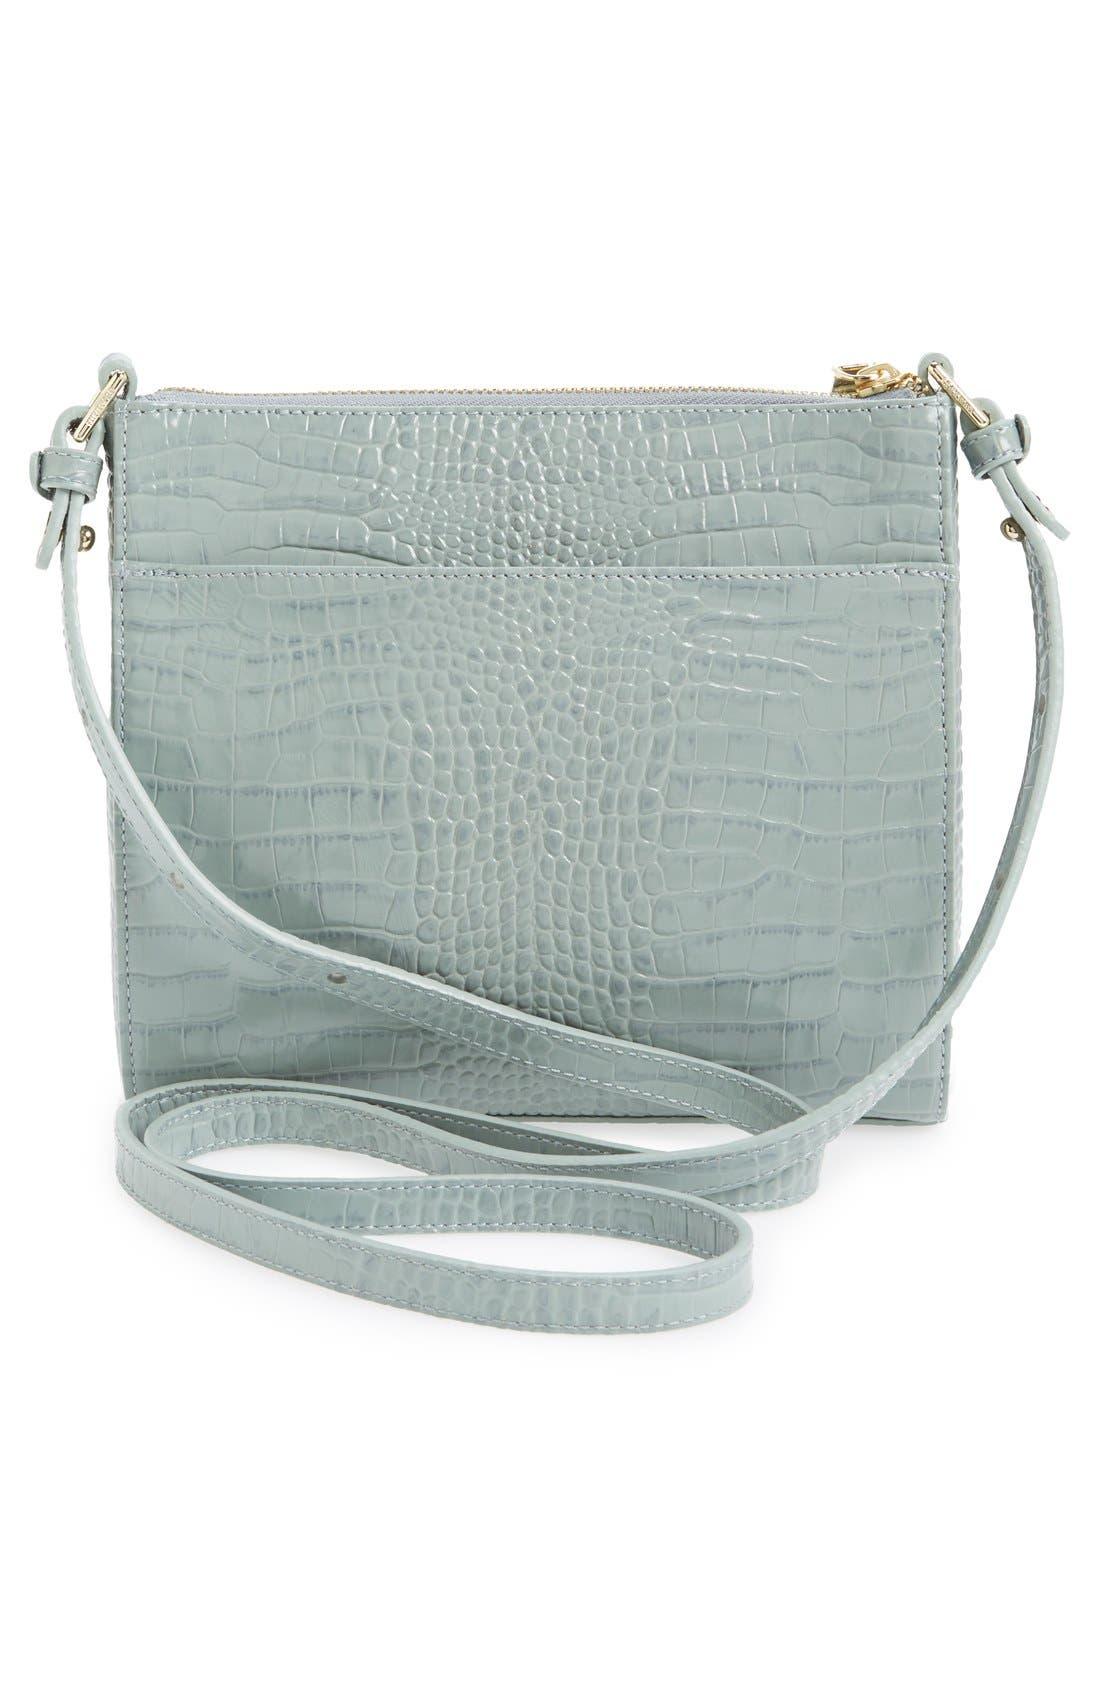 Alternate Image 3  - Brahmin 'Mimosa' Croc Embossed Leather Crossbody Bag